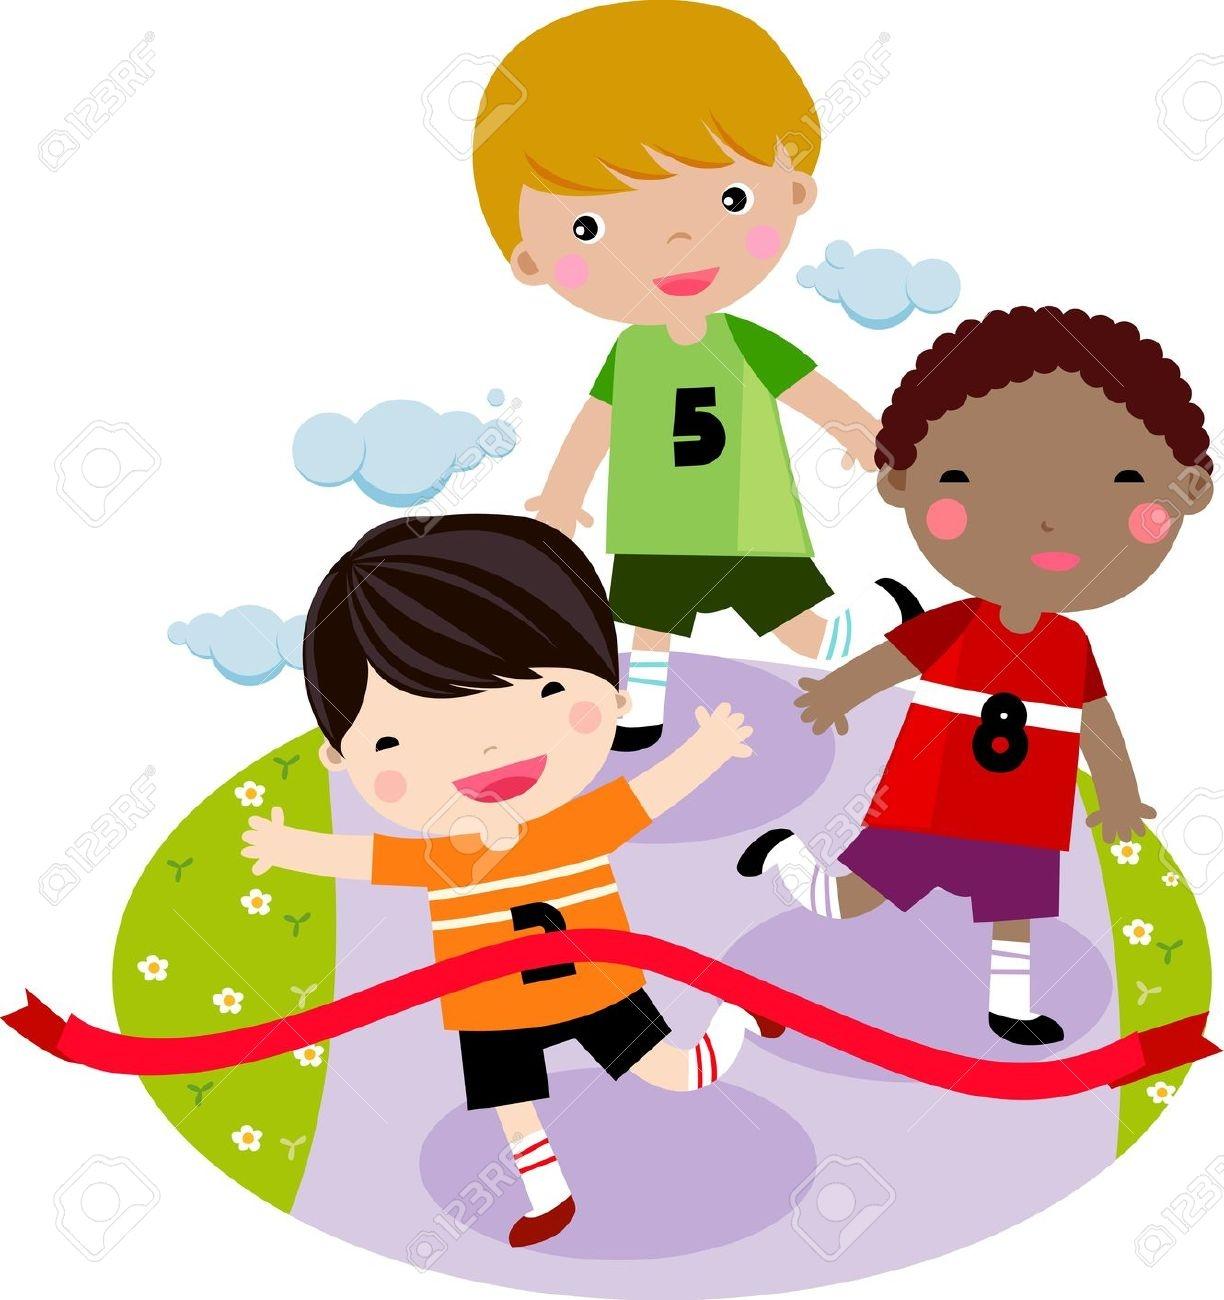 Free kids race clipart.